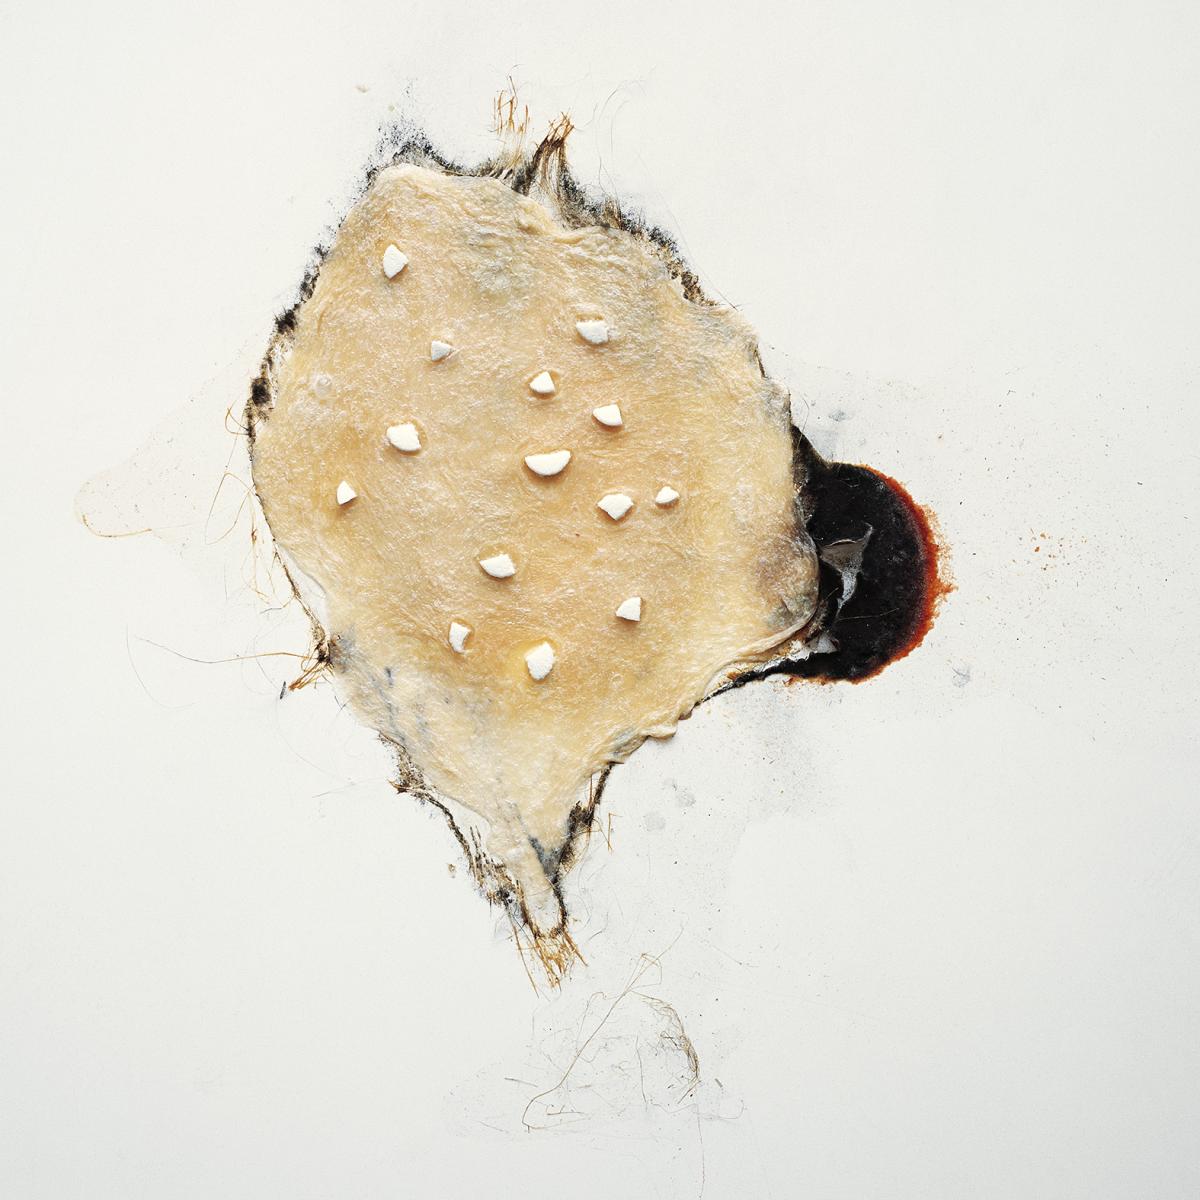 Filip Berendt, Pandemic III, 2009, photography archival print on dibond ed.62AP, 50×50 cm